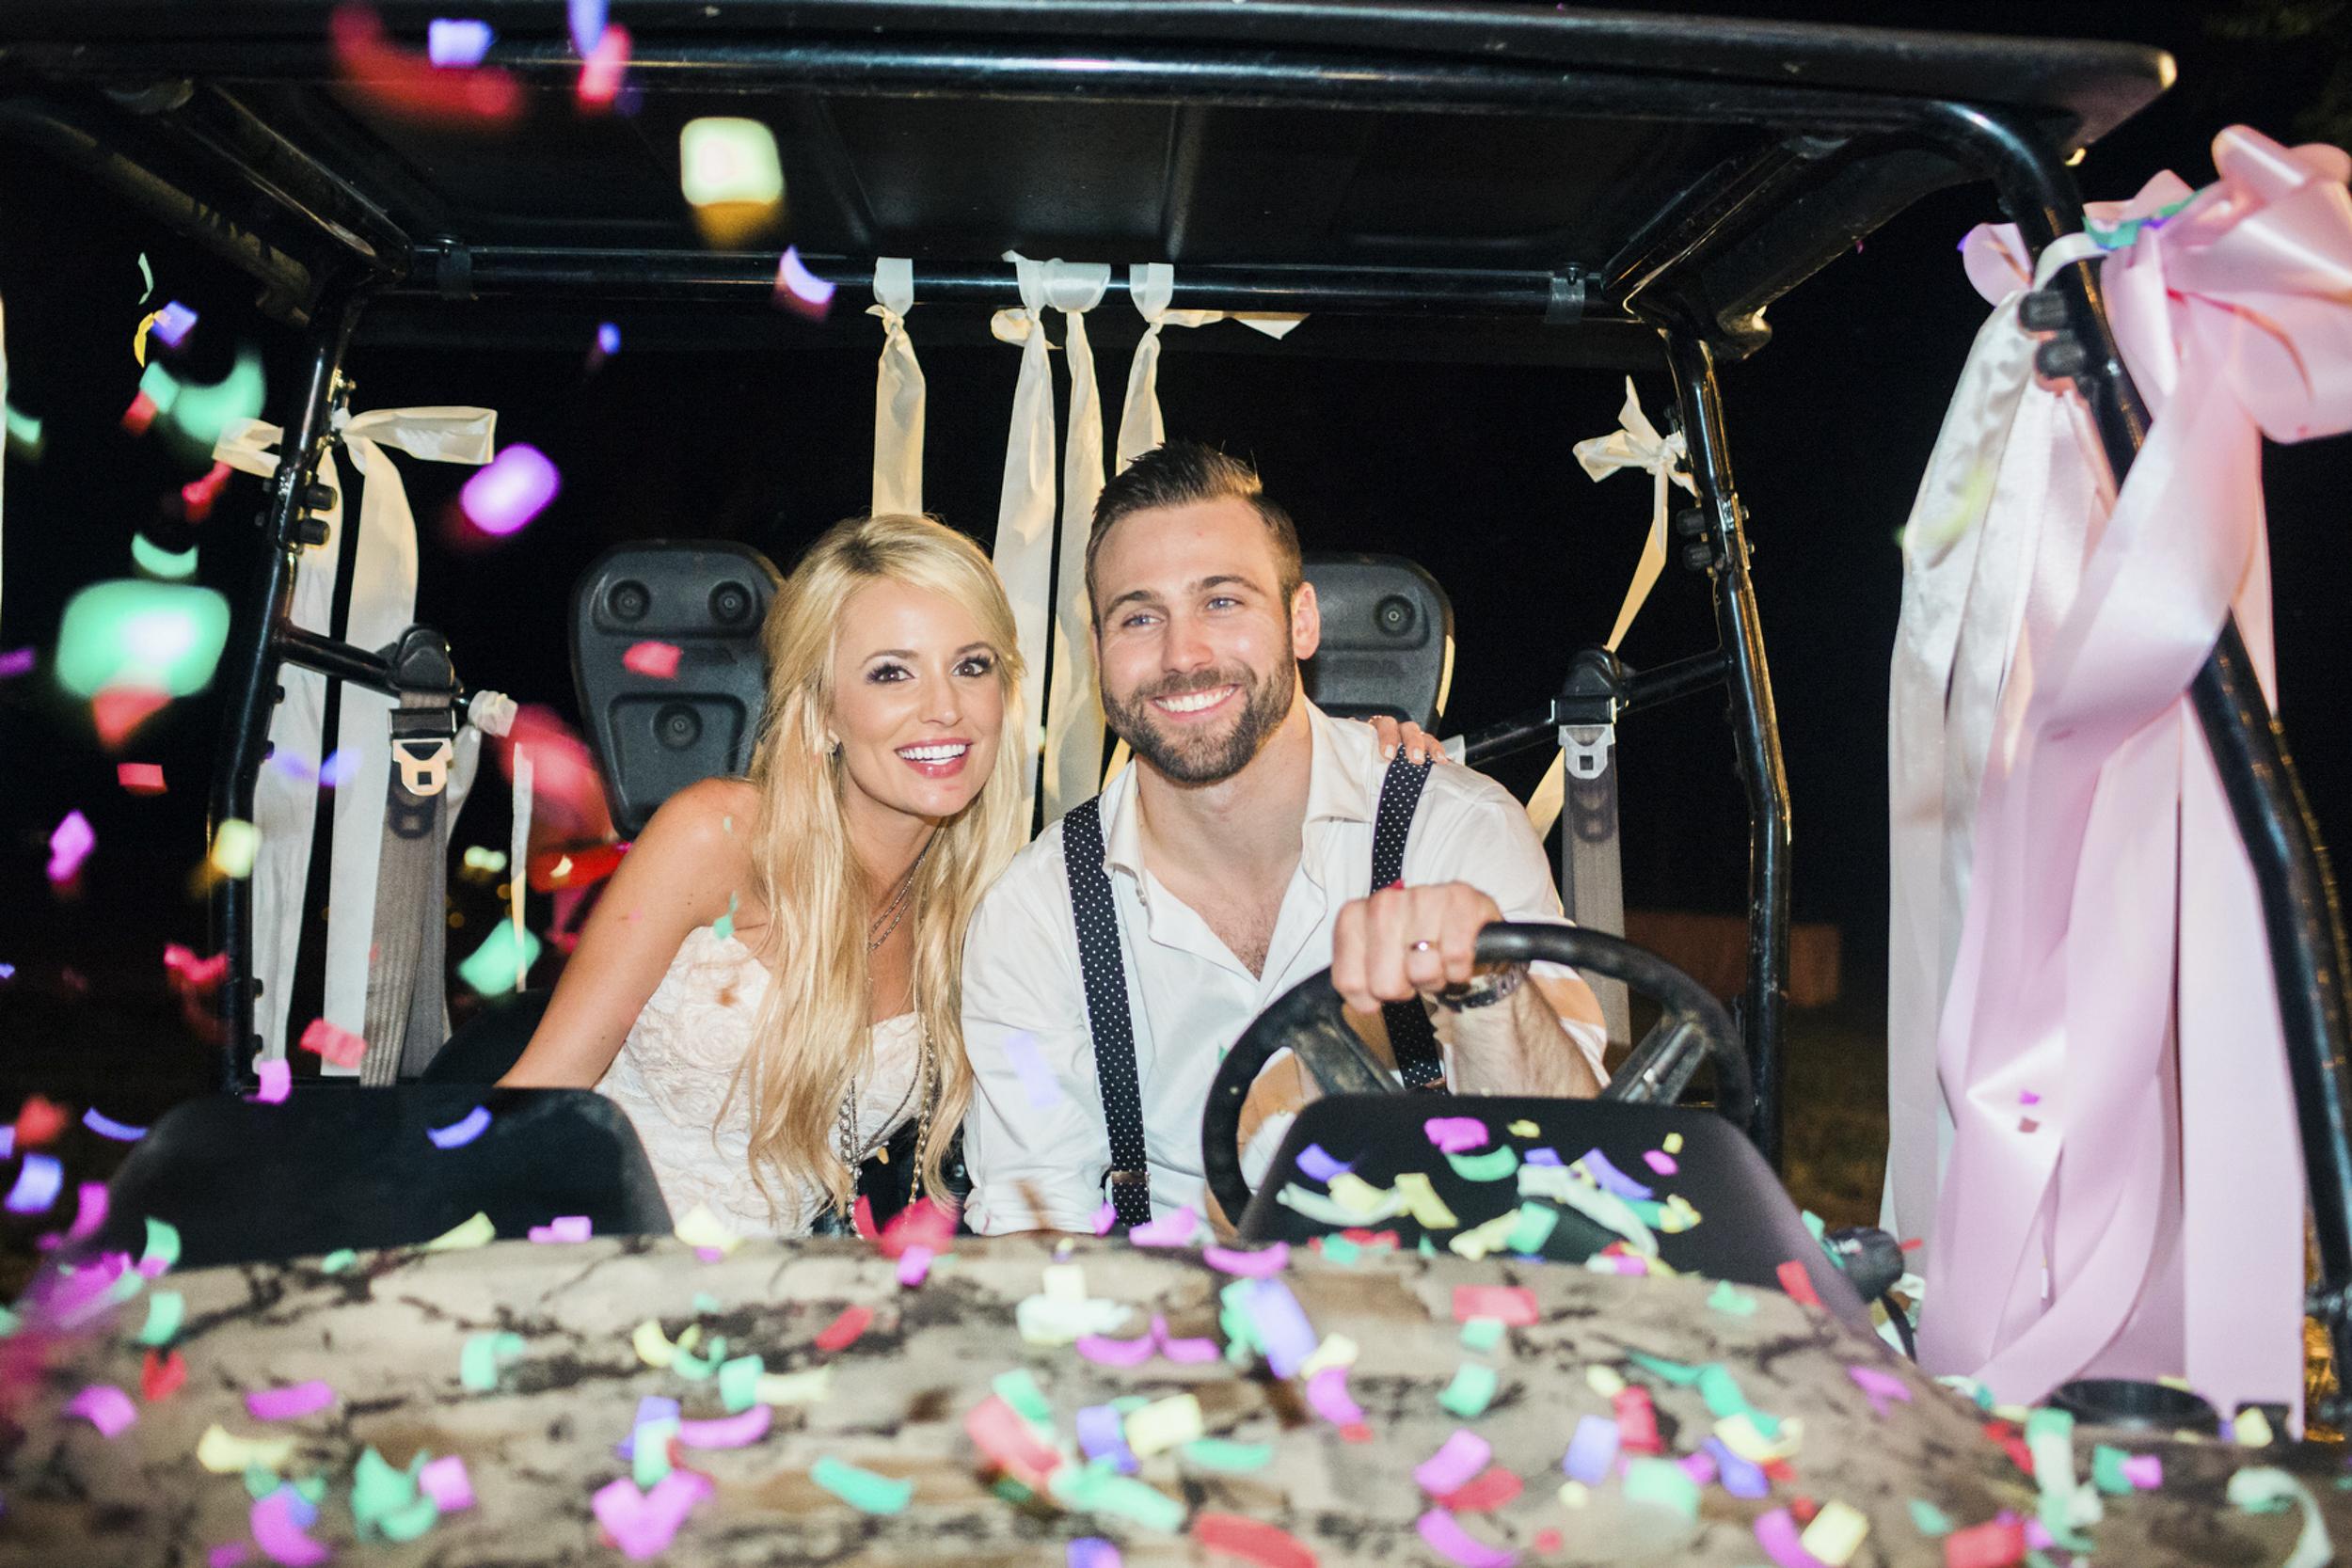 south_carolina_farm_wedding_rustic_chic_surprise_secret_luxe_wedding_bachelorette_emily_maynard_real_weddings-43.jpg